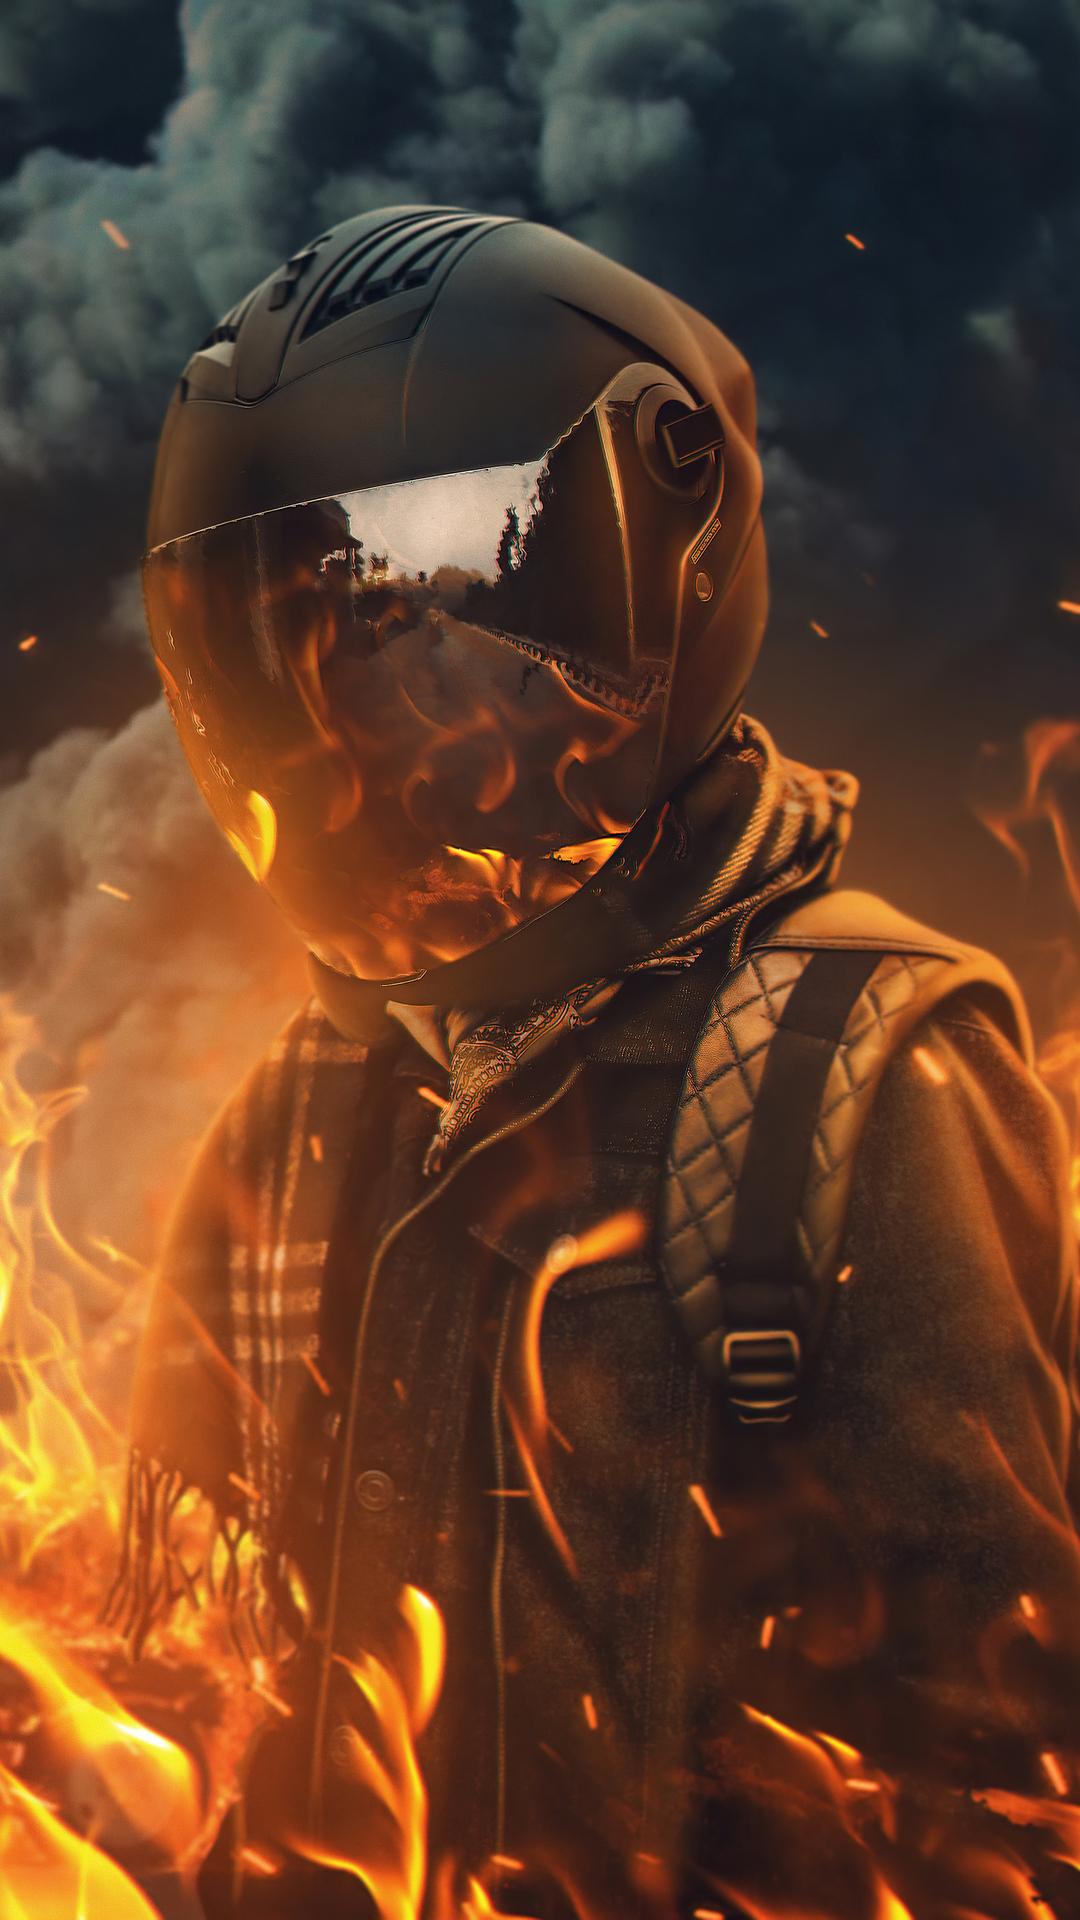 biker-helmet-fire-4k-lq.jpg